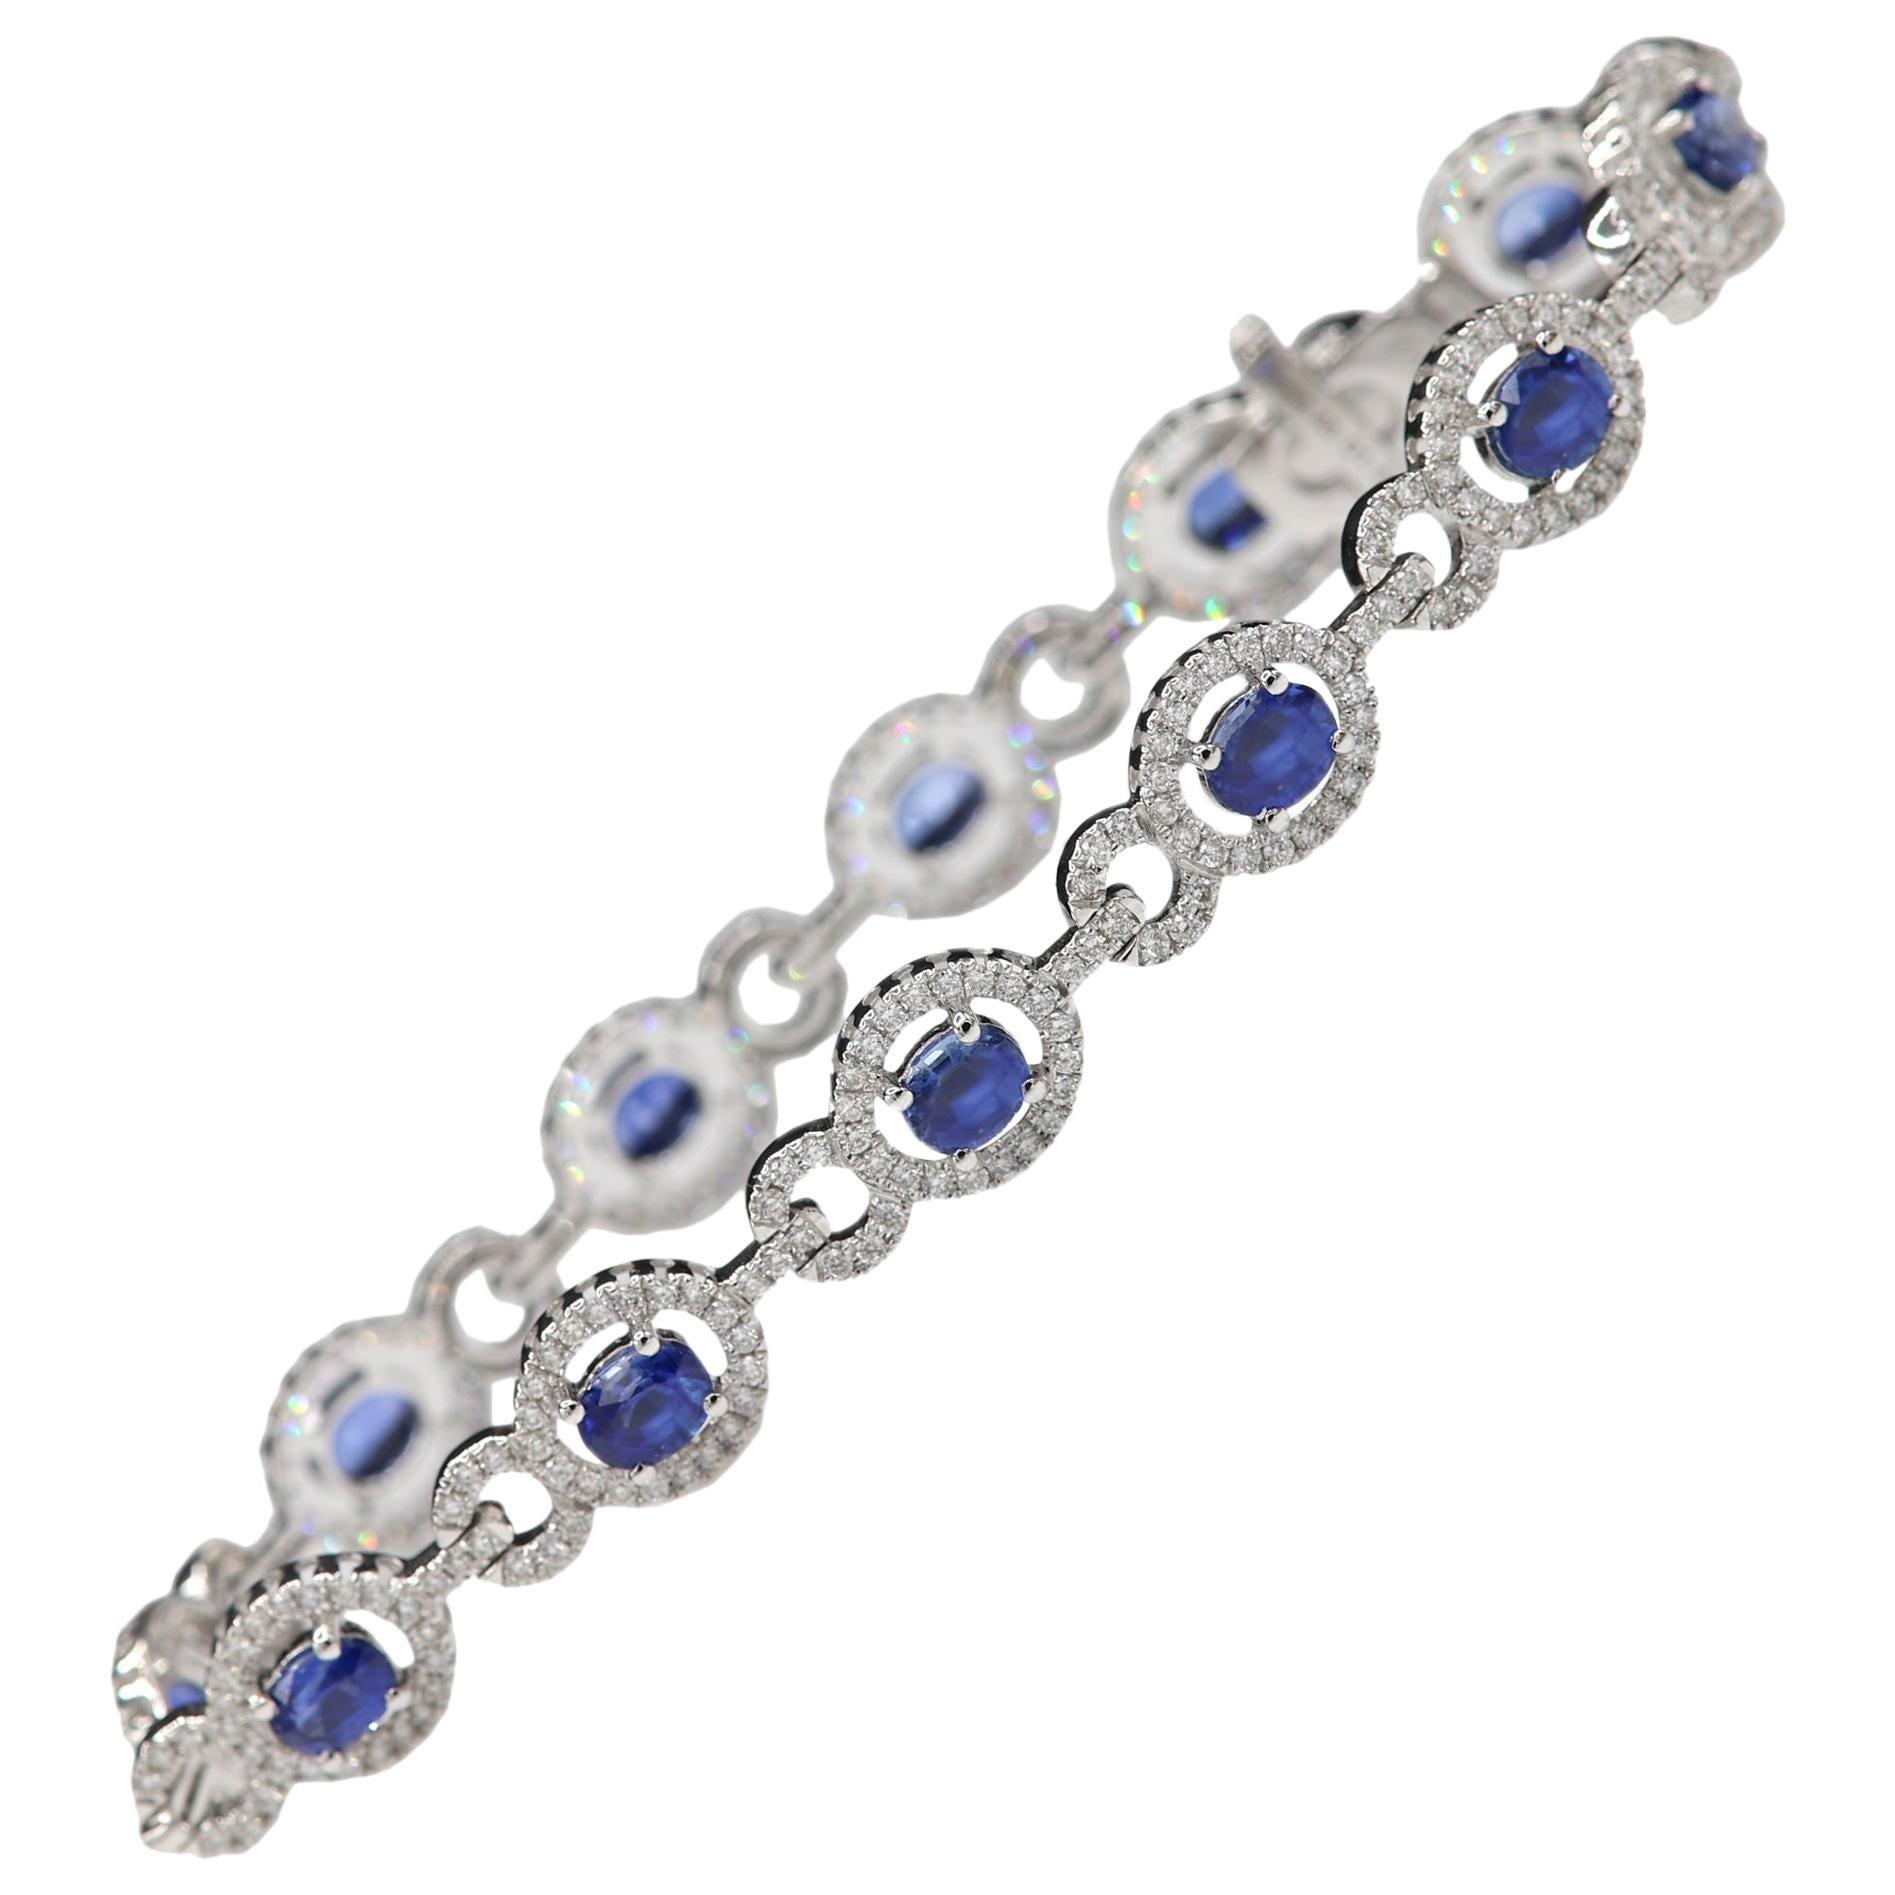 Natural Blue Sapphire Bracelet 18 Karat White Gold and Diamonds Oval Sapphire